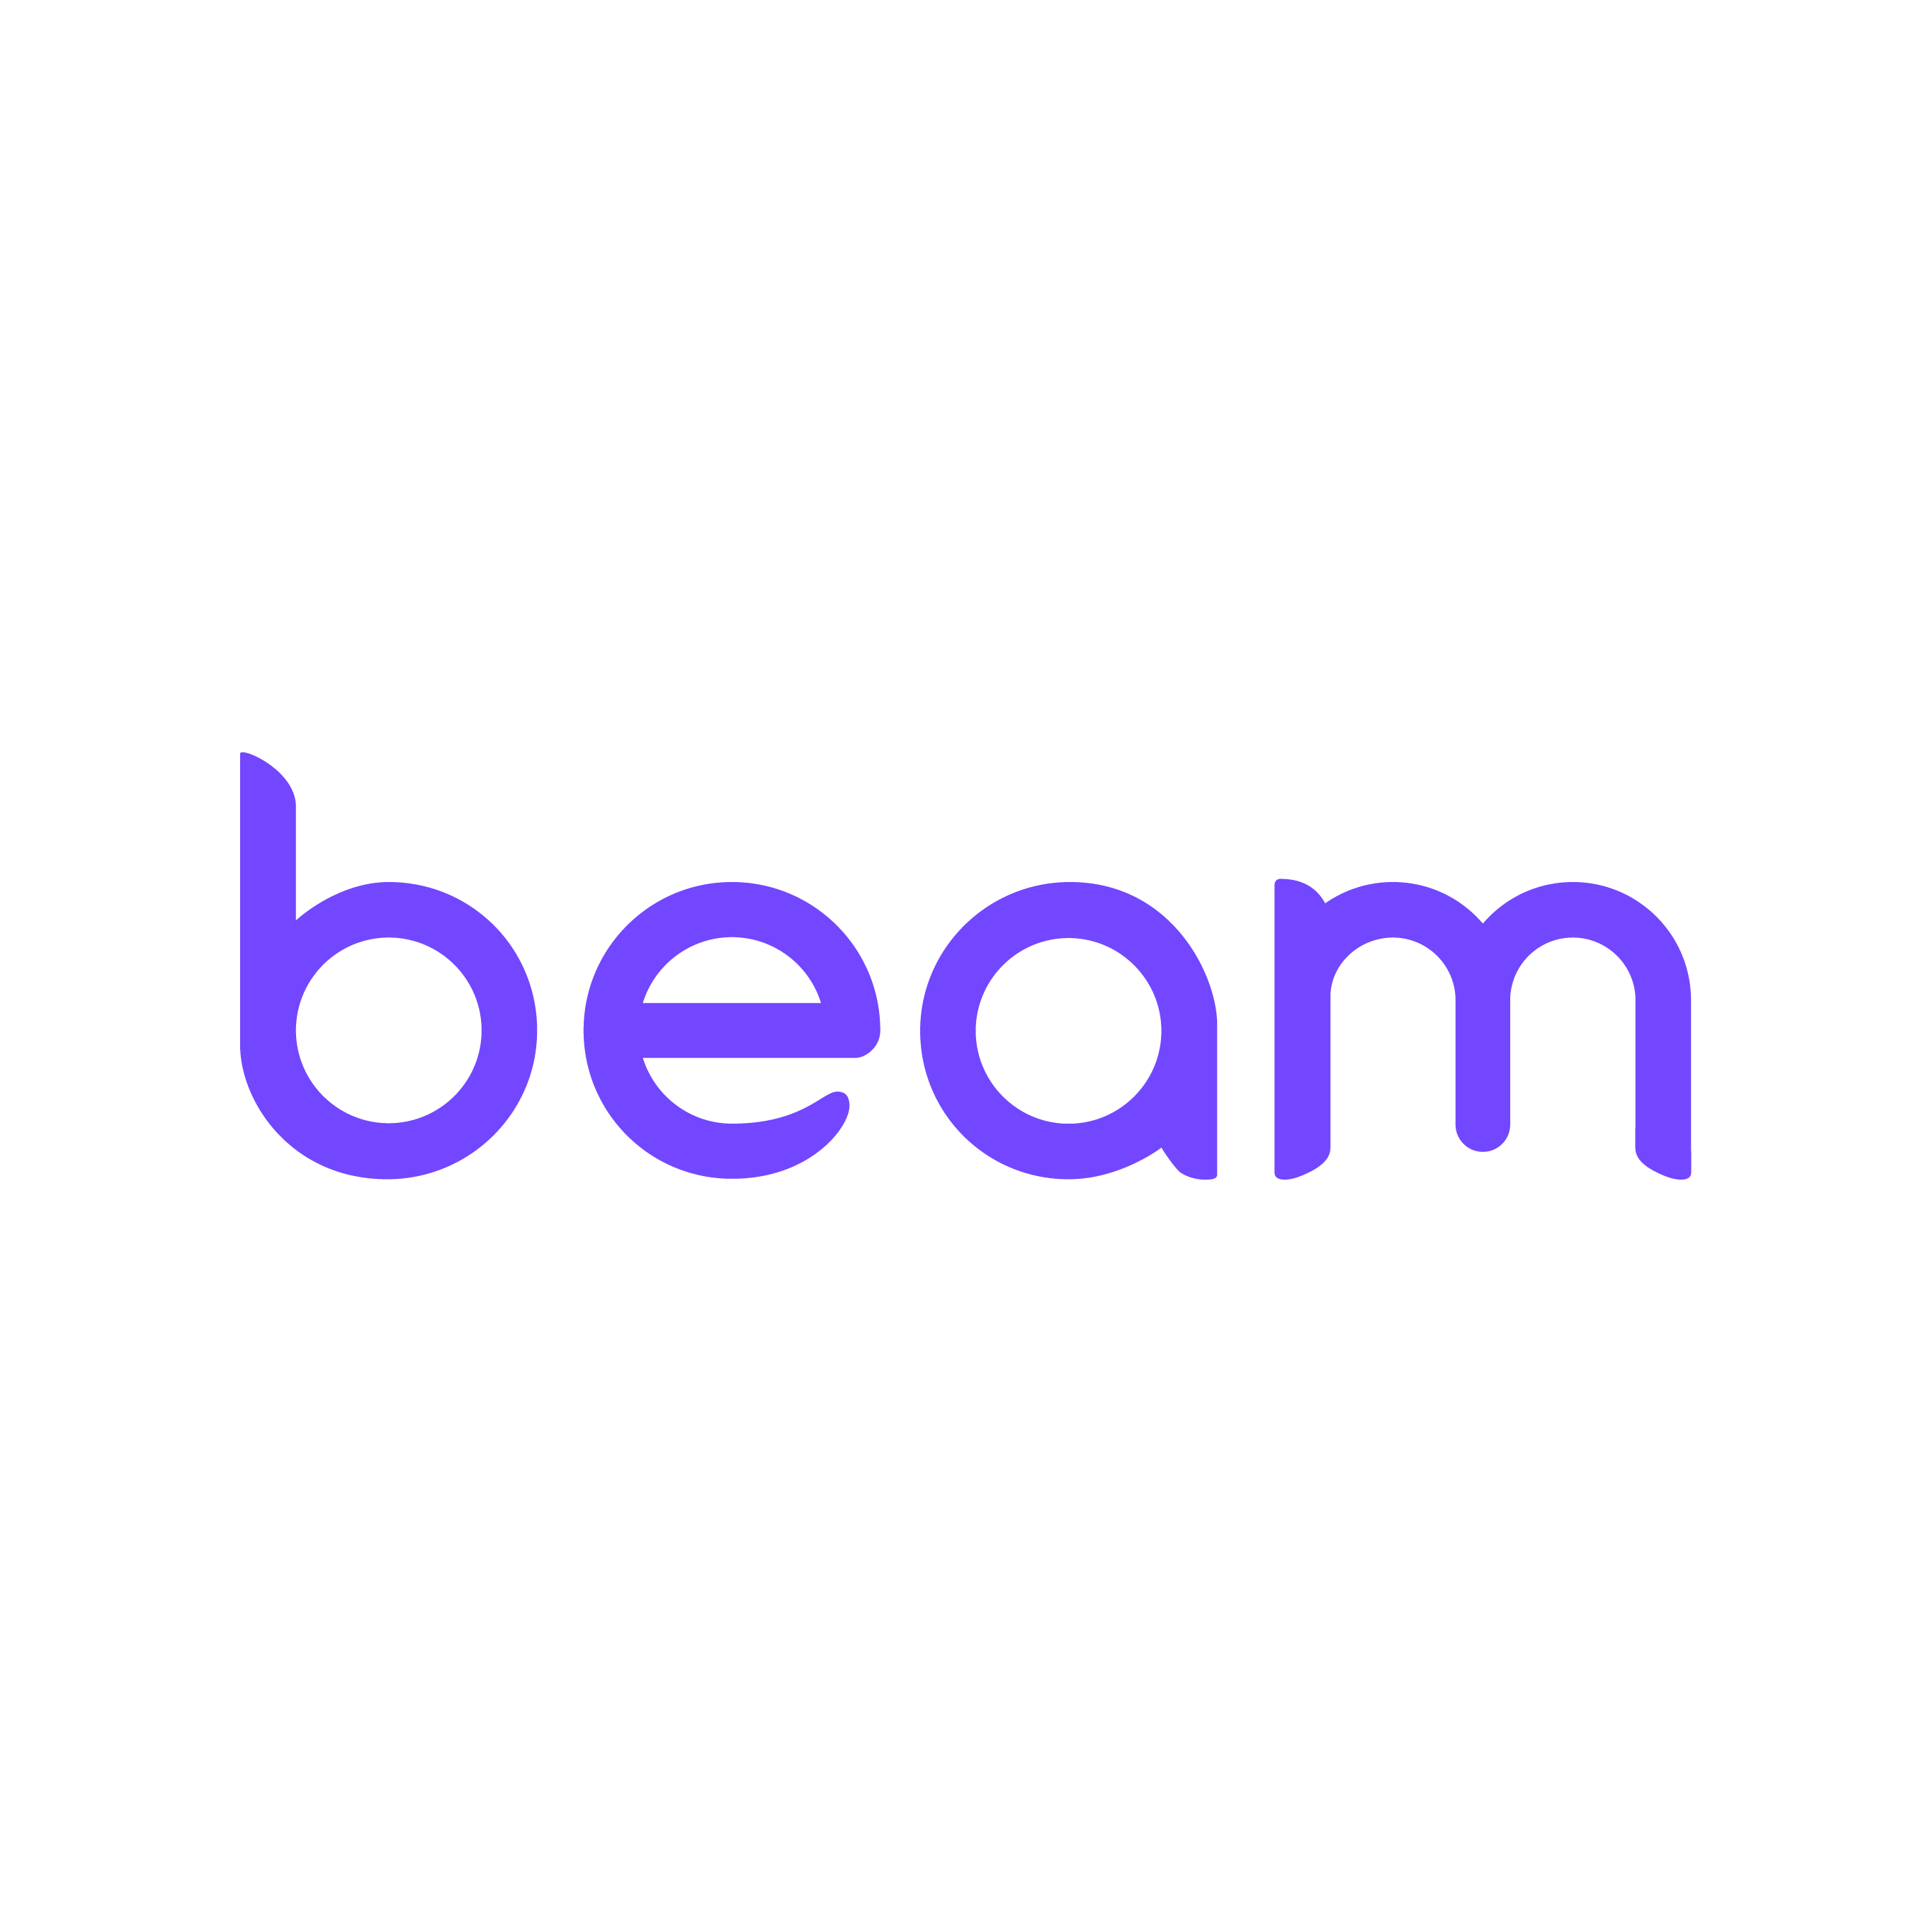 Beam white logo